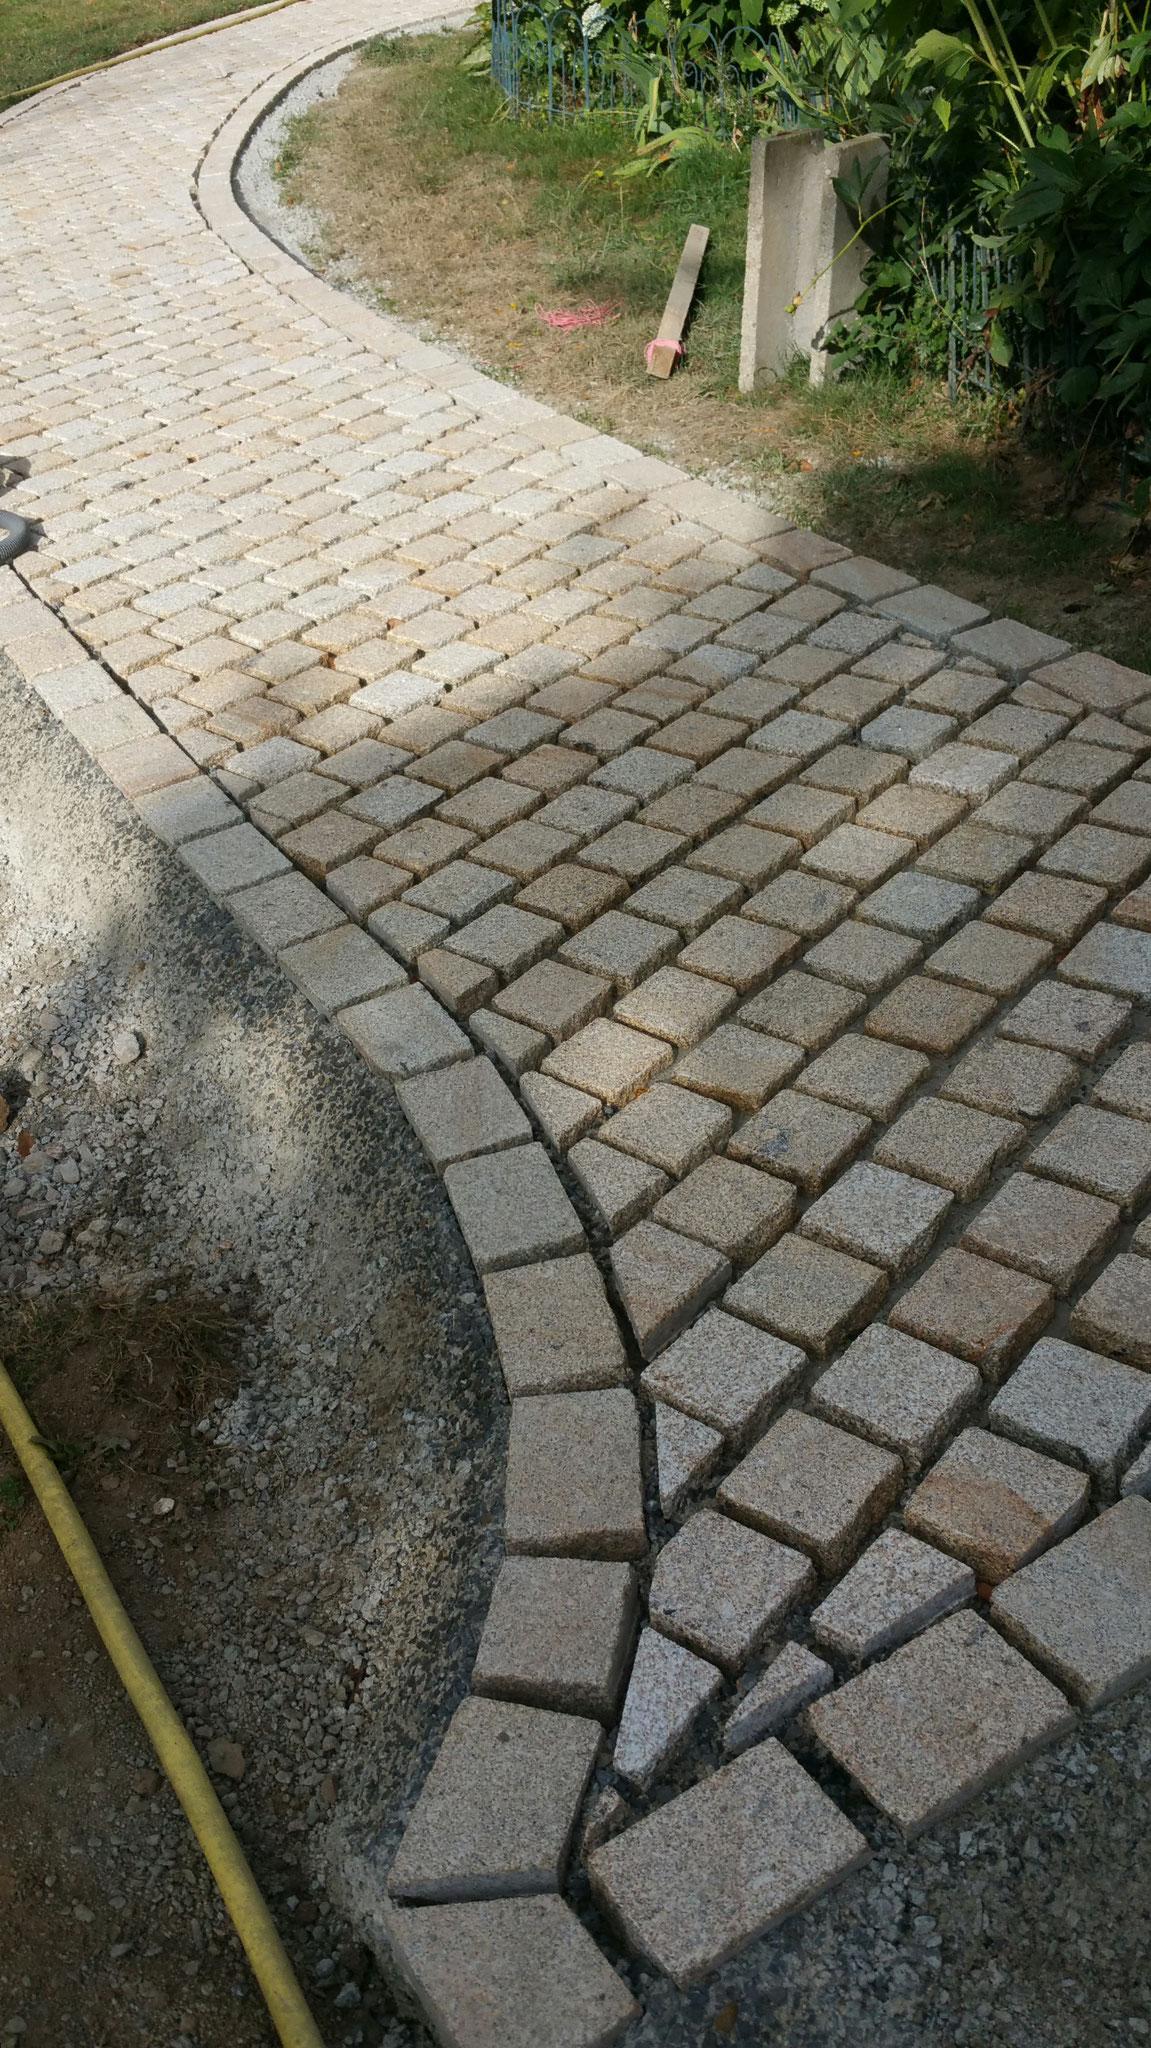 allé jardin  pave granit jaune boucharde  10*10*5 + 15*10*5